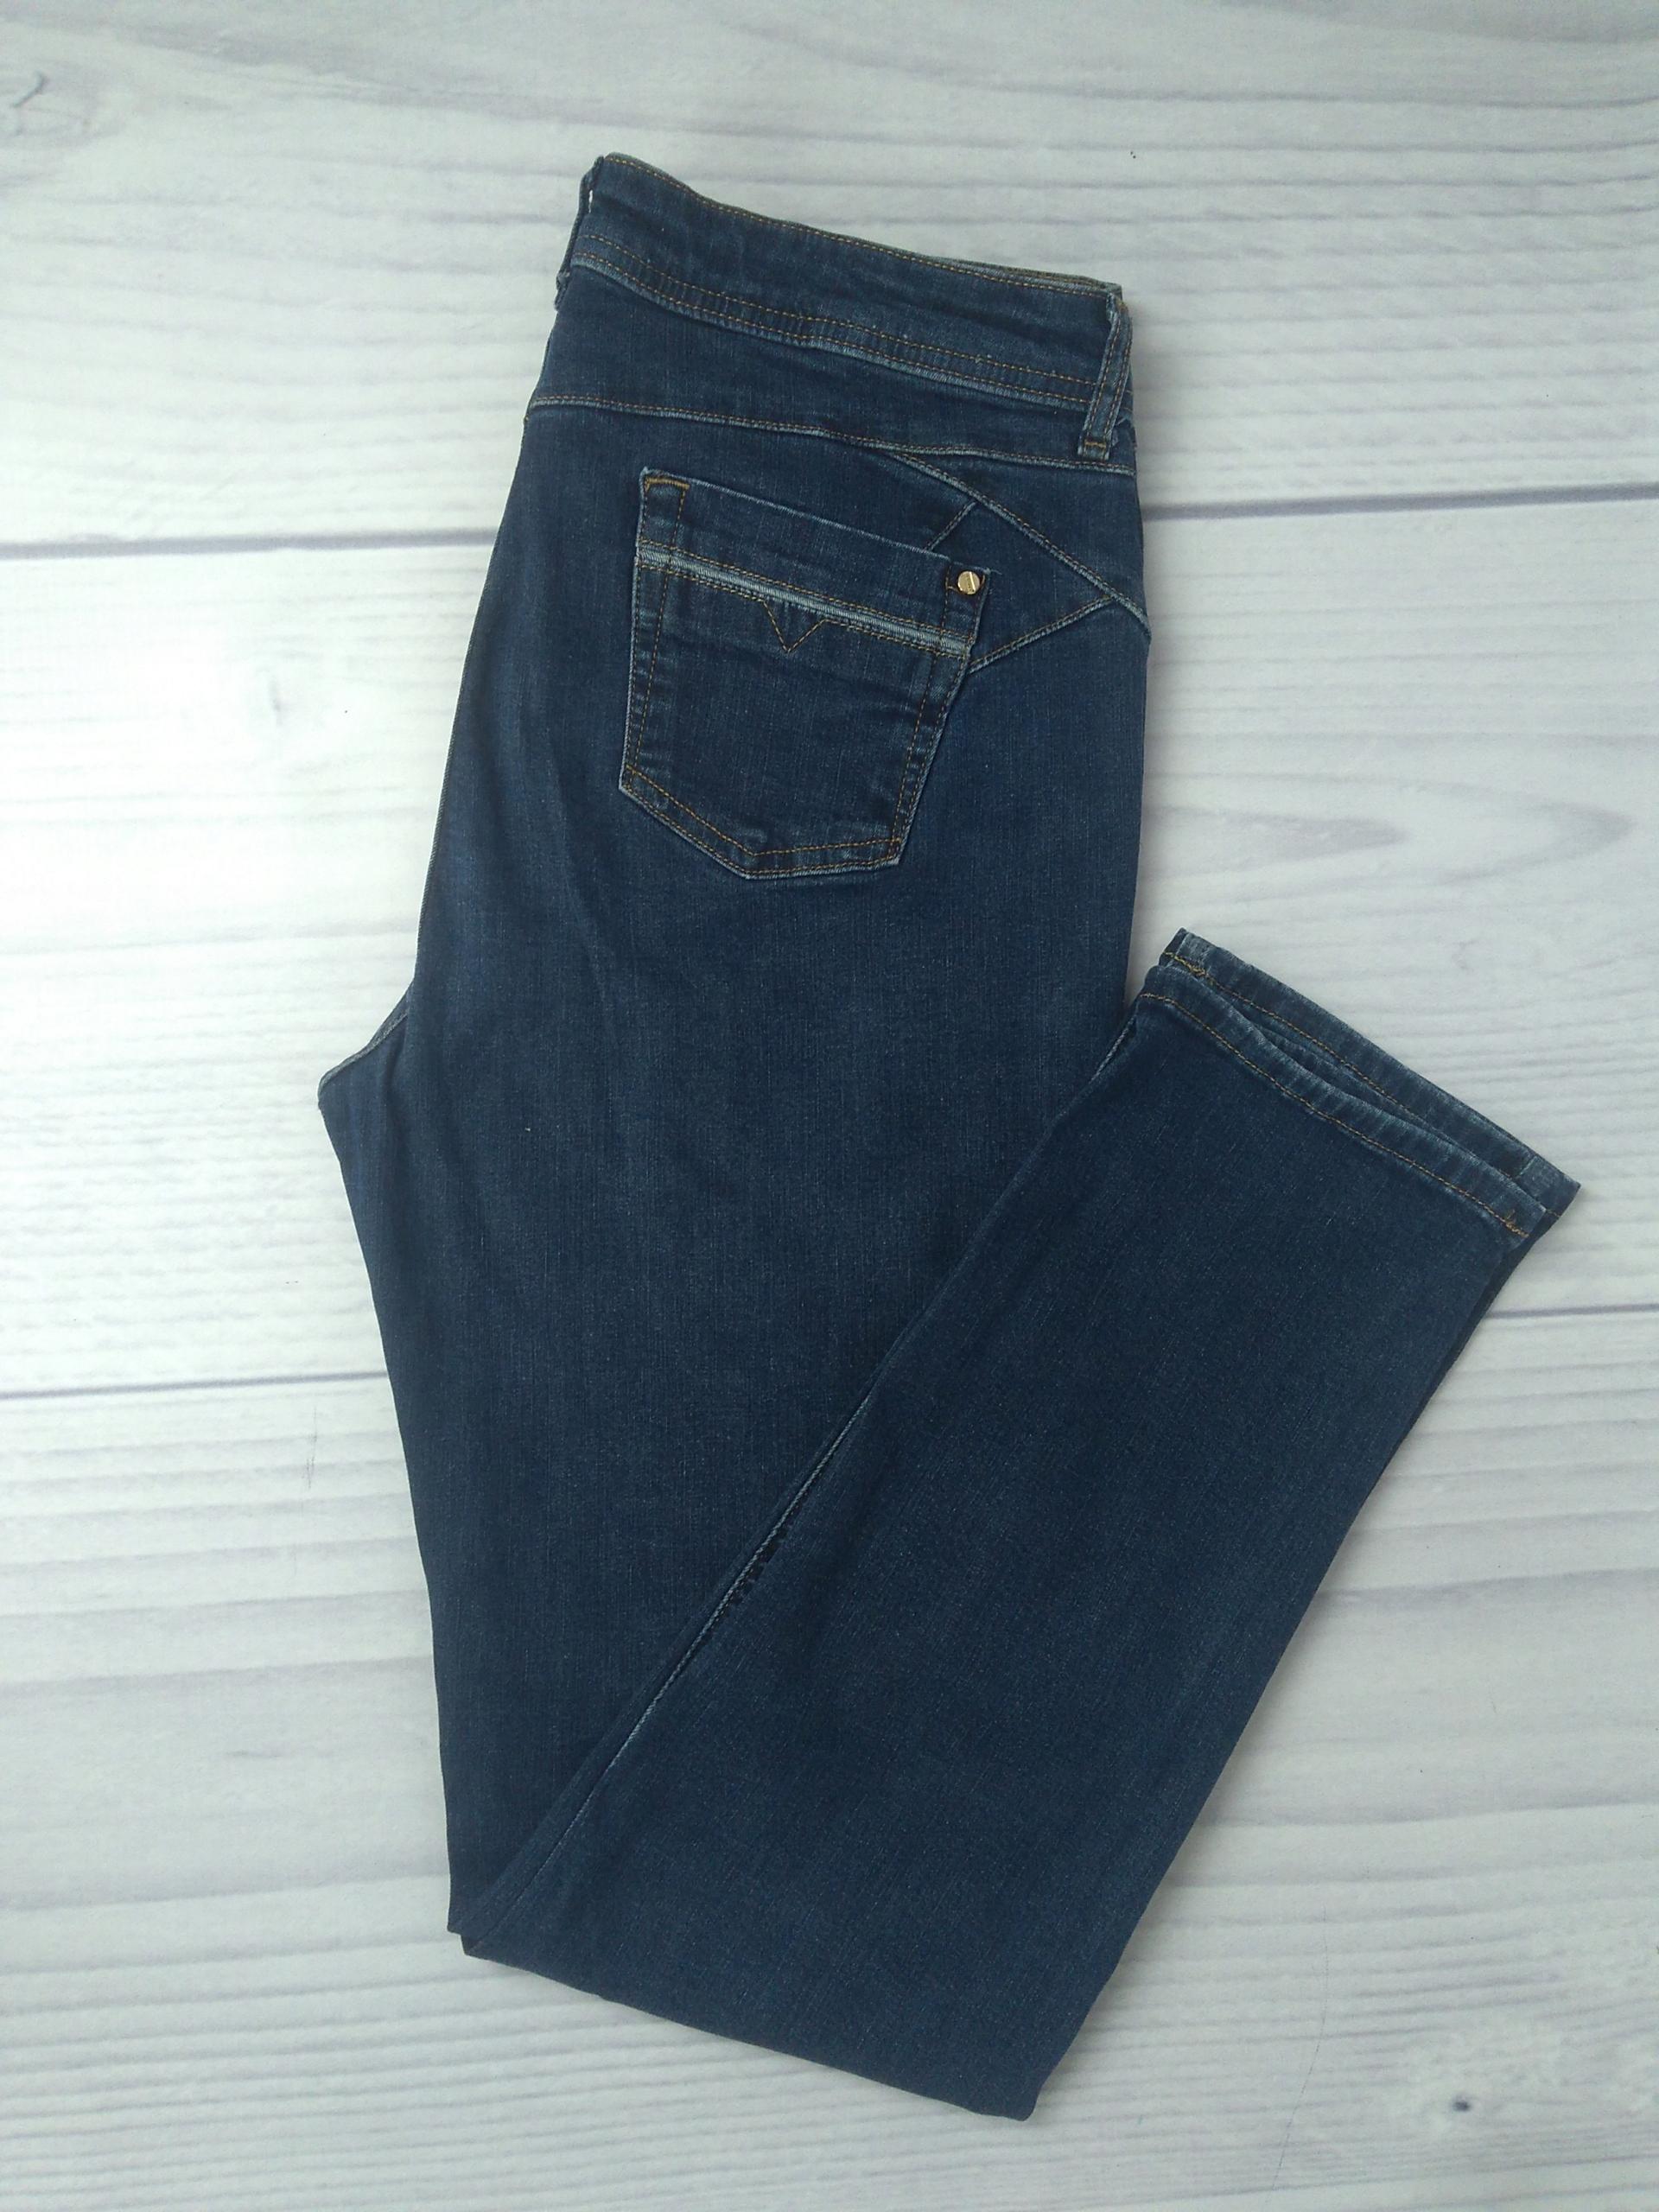 Rozm 42 Ciemne spodnie jeansy dżinsy Marks&S